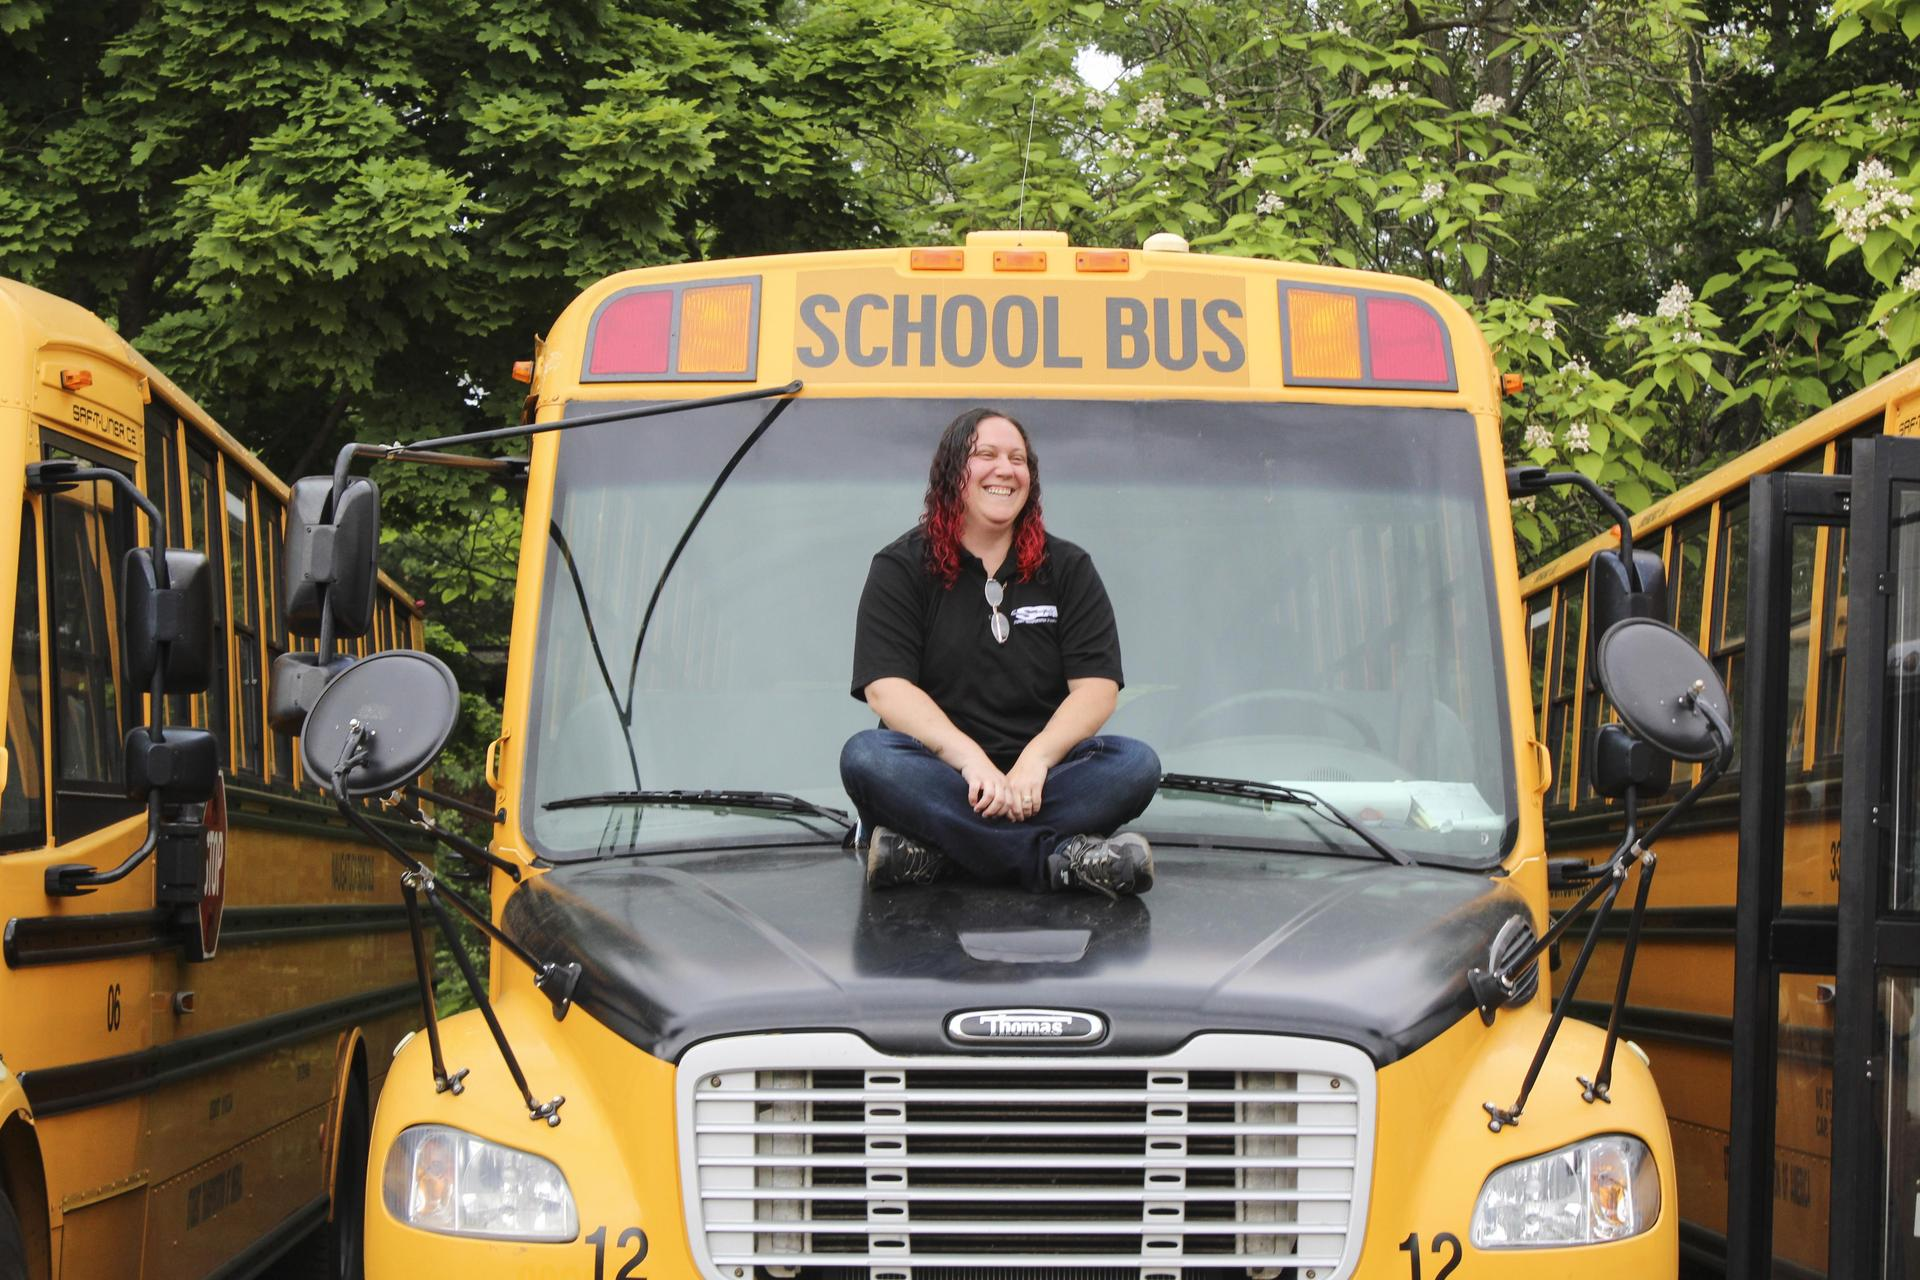 Bus driver sitting on hood of school bus